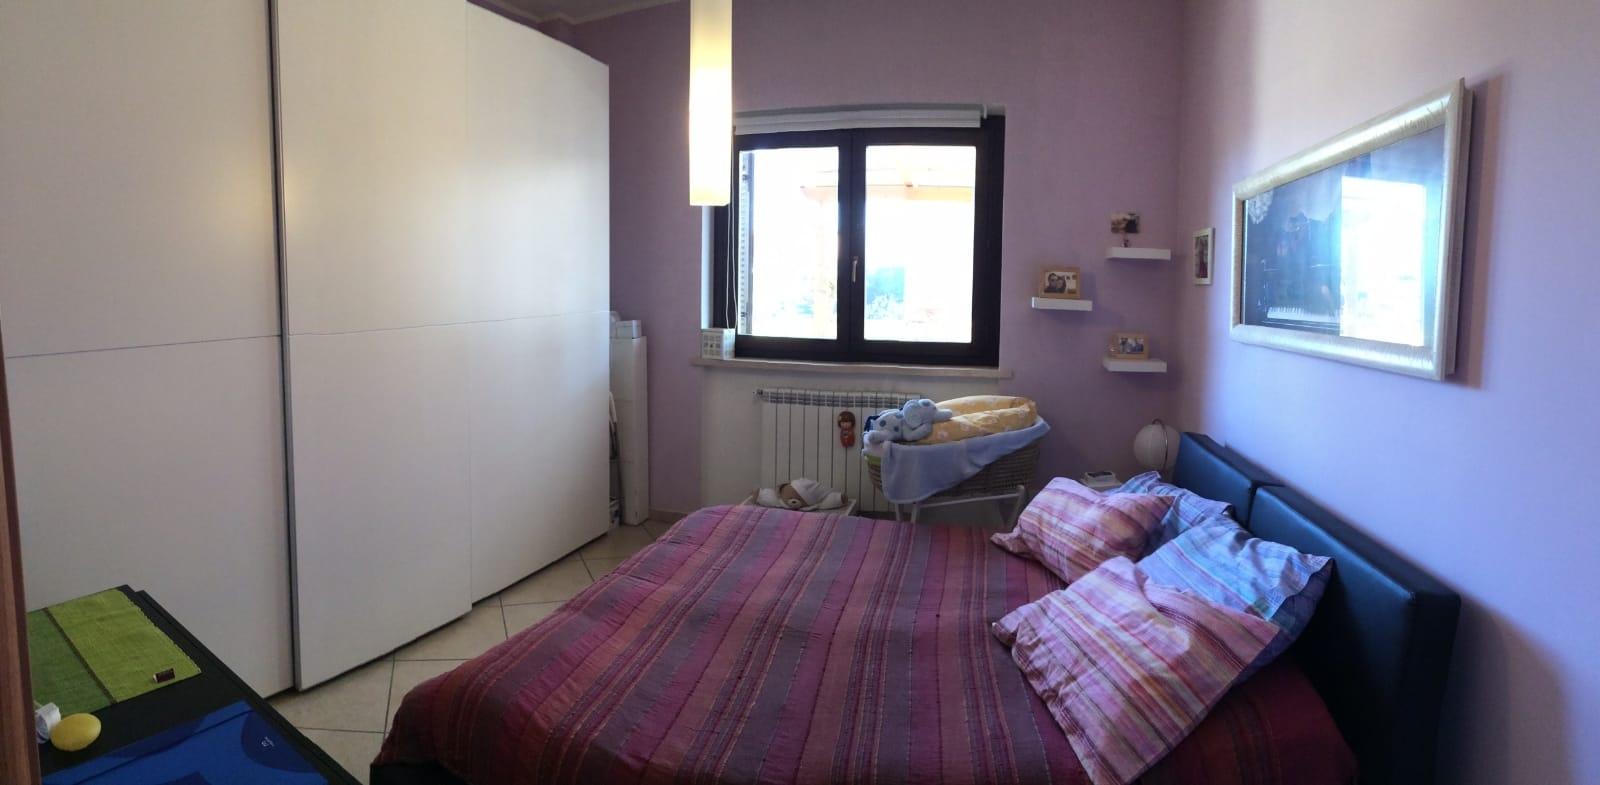 Appartamento, 50 Mq, Vendita - Viterbo (Viterbo)